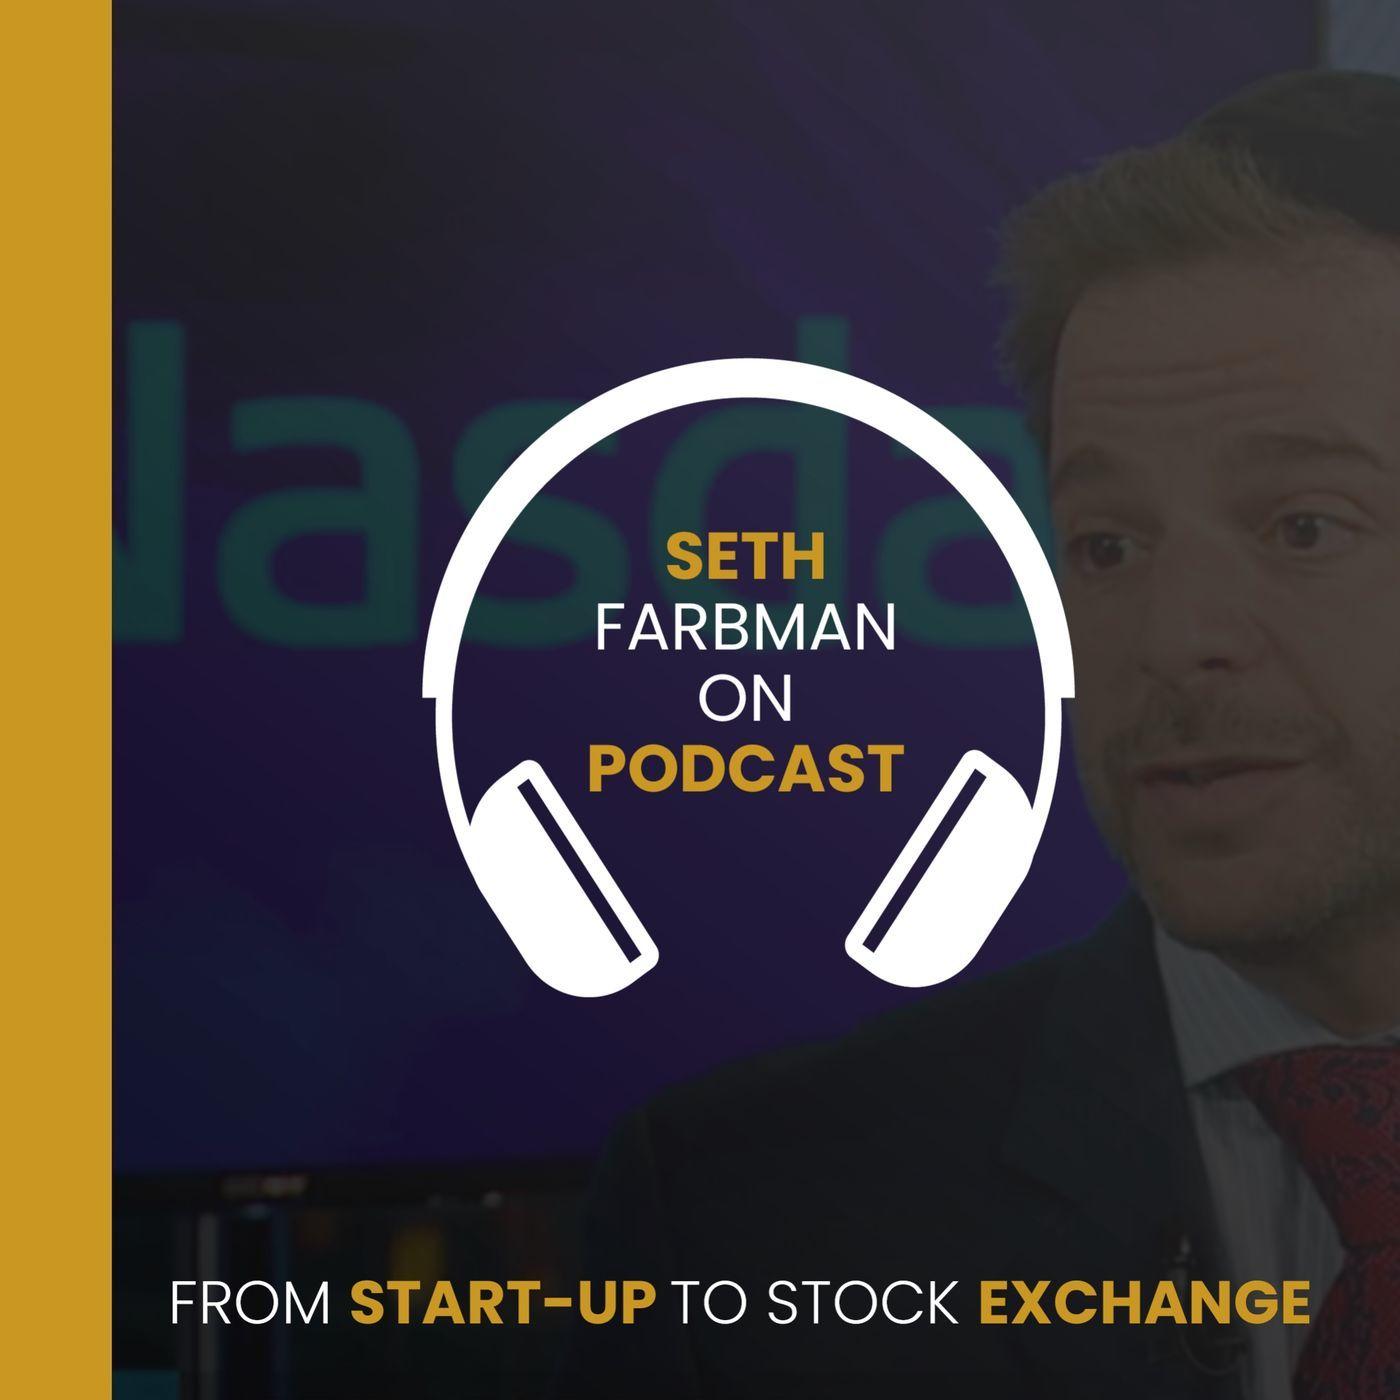 PLOP PLOP FIZ FIZ: Seth Farbman sits with mobile ad tech company JINGLZ